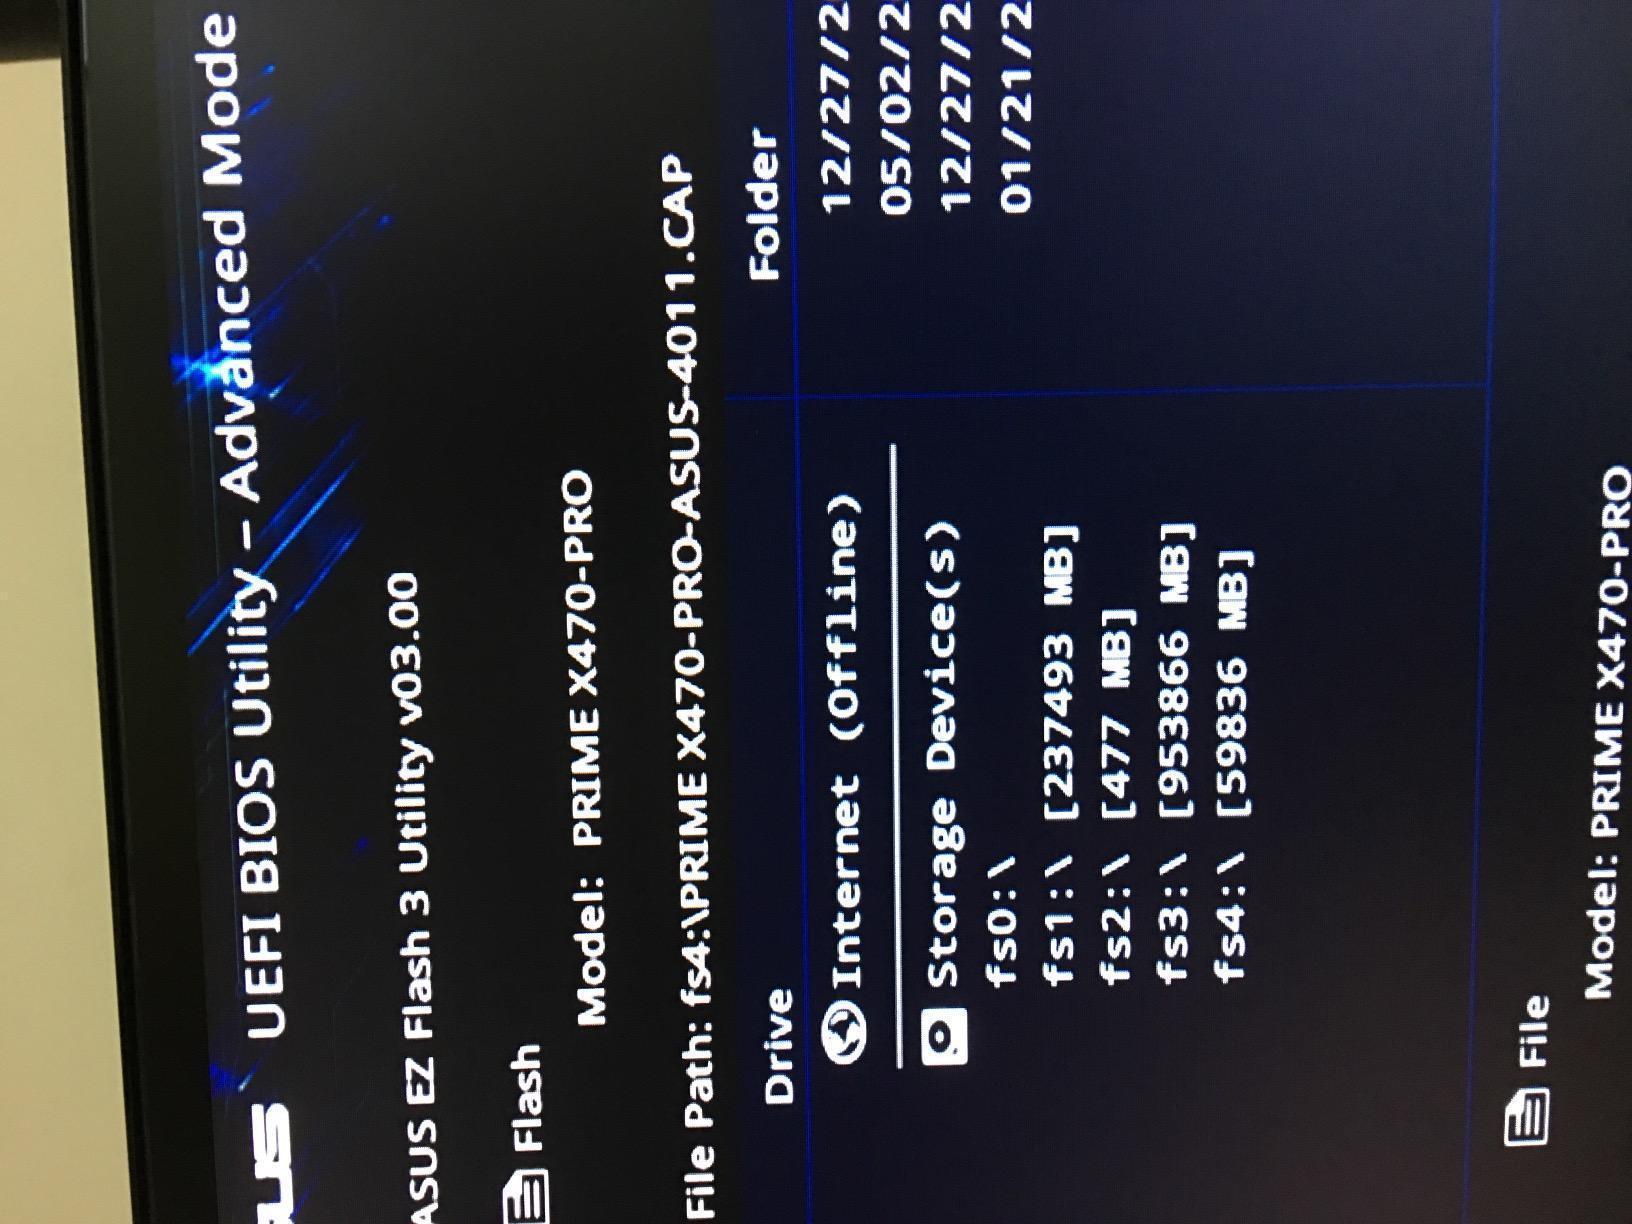 ASUS Prime X470-Pro AMD Ryzen 2 AM4 DDR4 DP HDMI M 2 USB 3 1 ATX